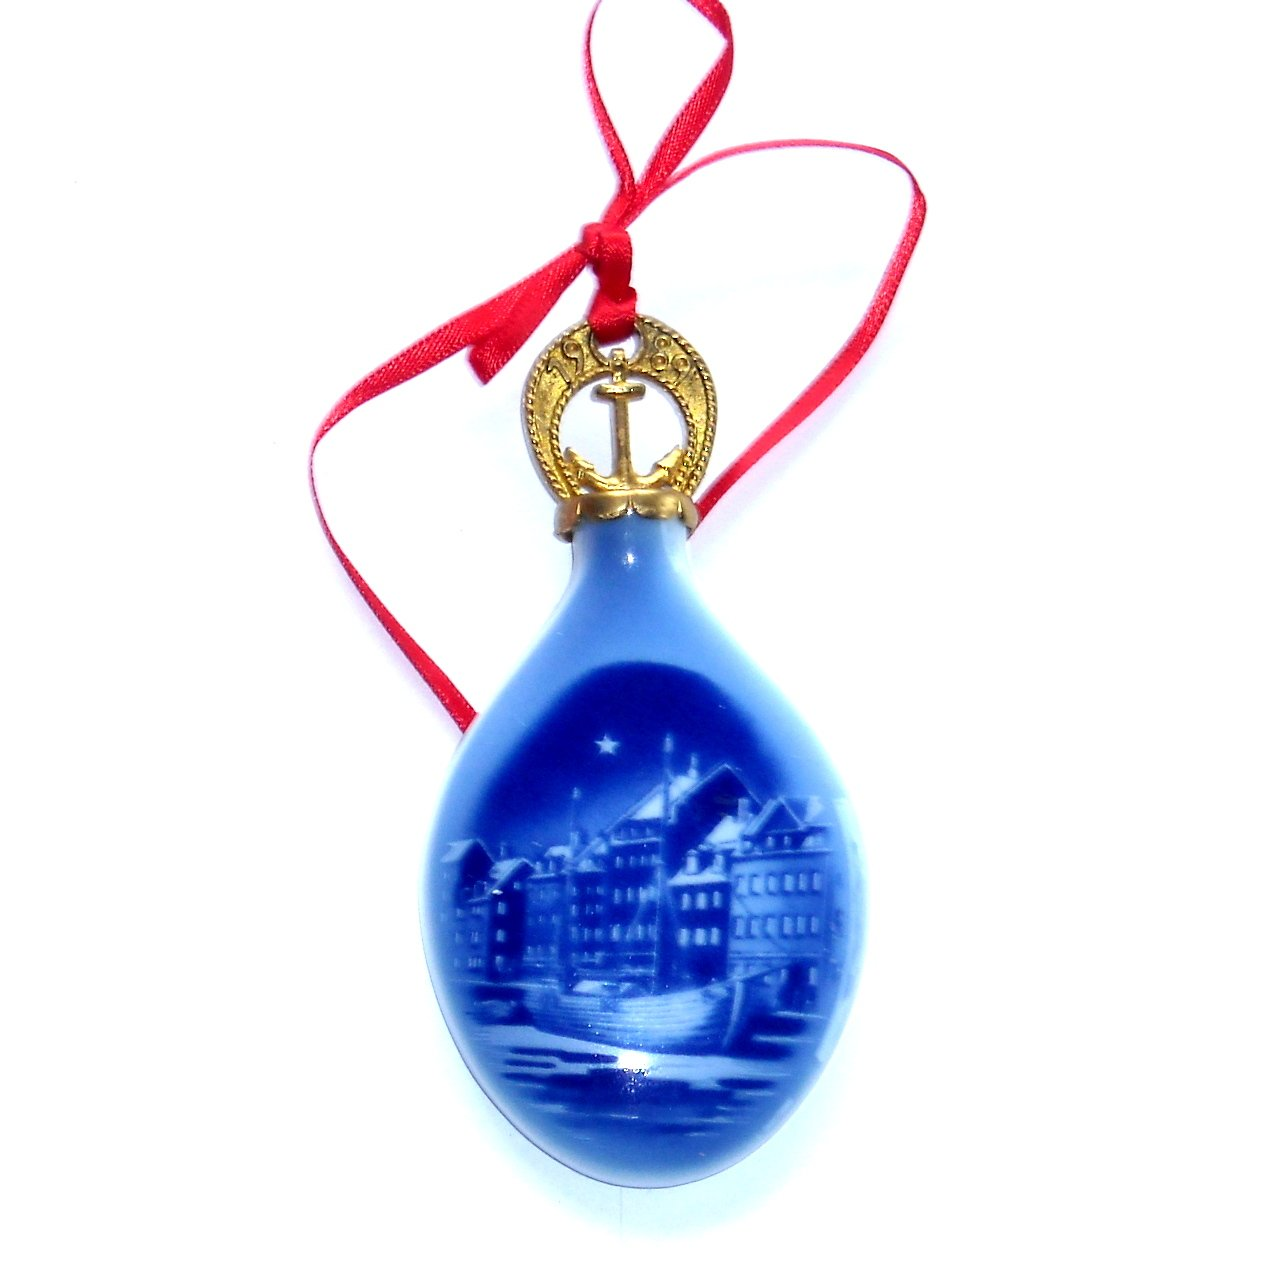 Bing & Grondahl Copenhagen Denmark Christmas Drop Ornament 1989 Boxed